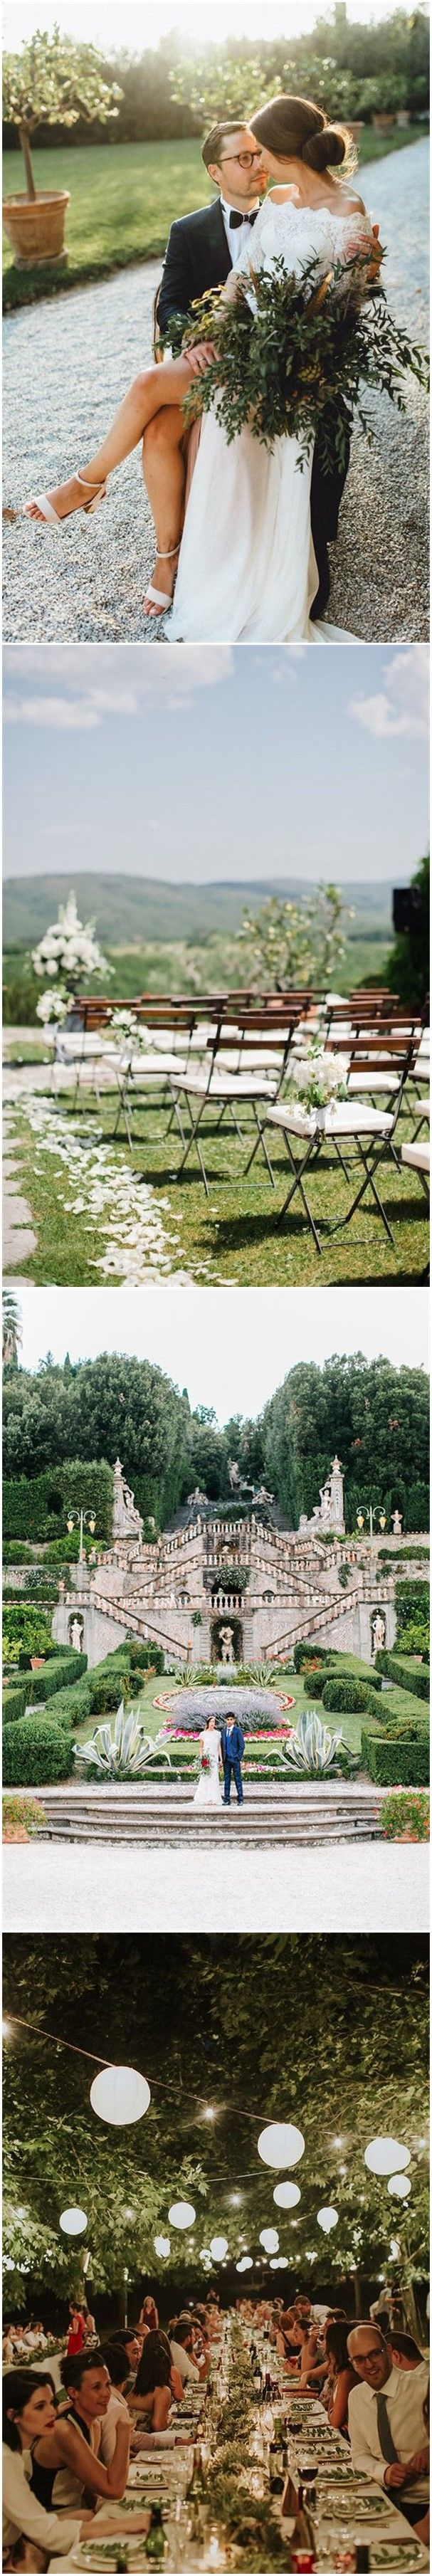 242 best beach wedding images on pinterest